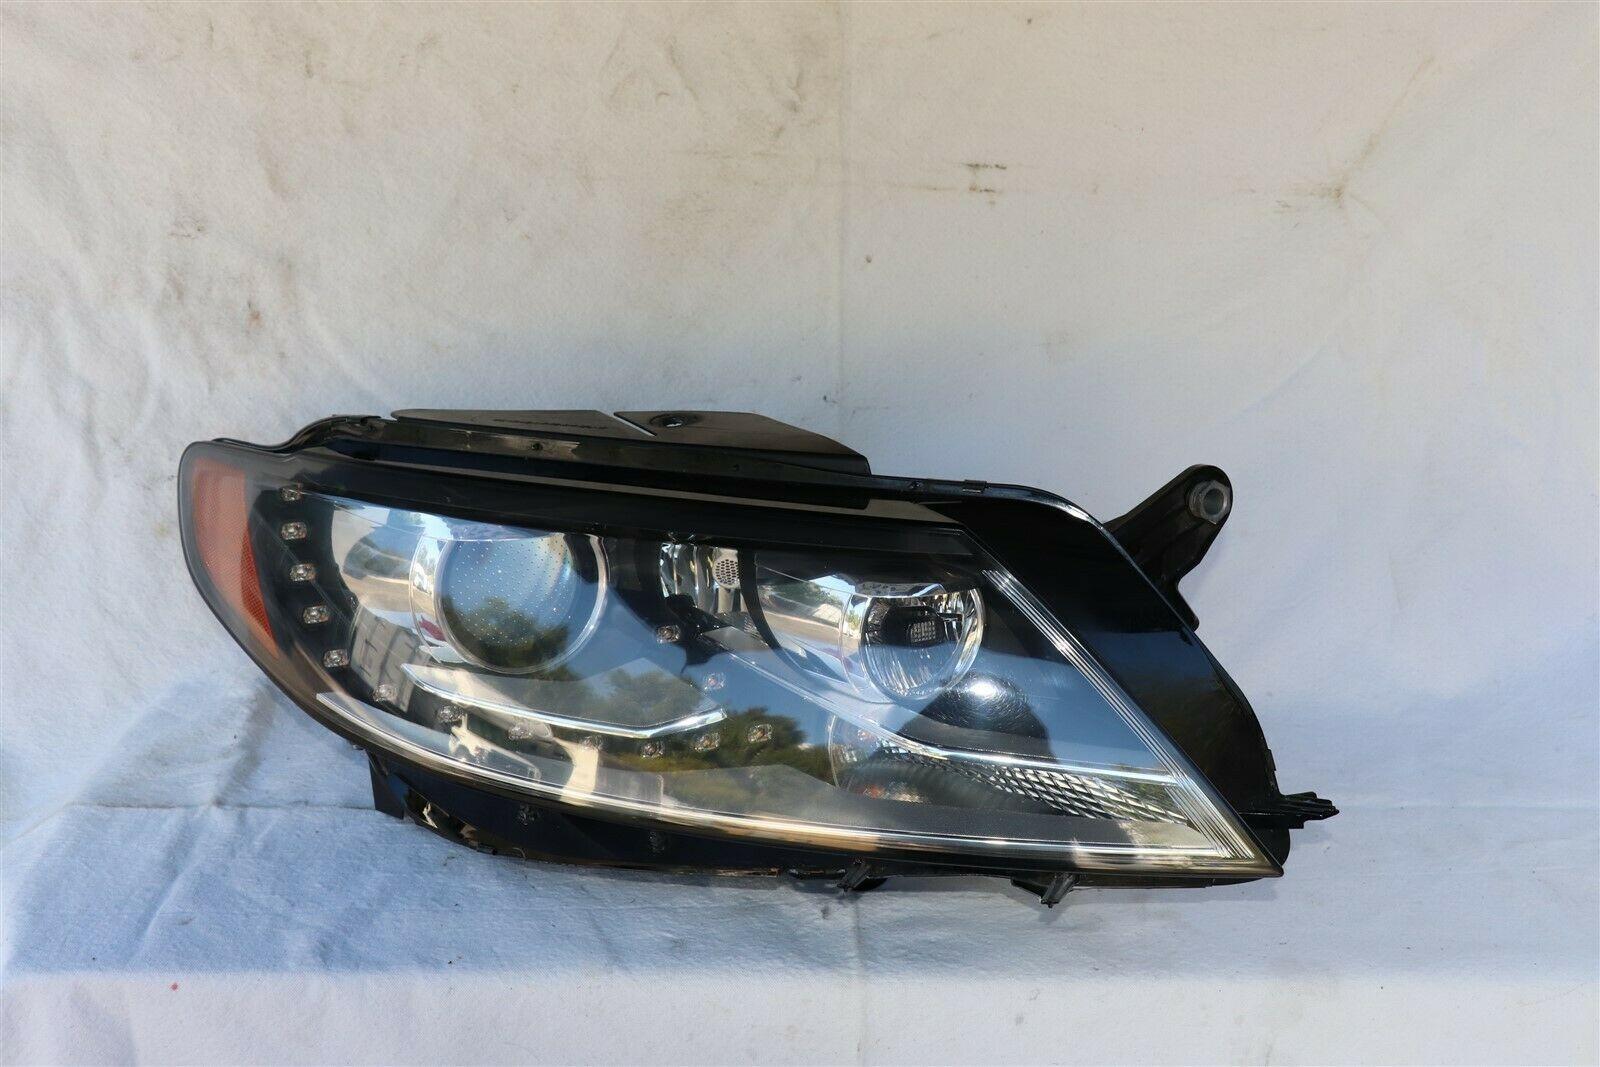 13-17 VW Volkswagen CC HID Xenon AFS Headlight Lamp Passenger Right RH